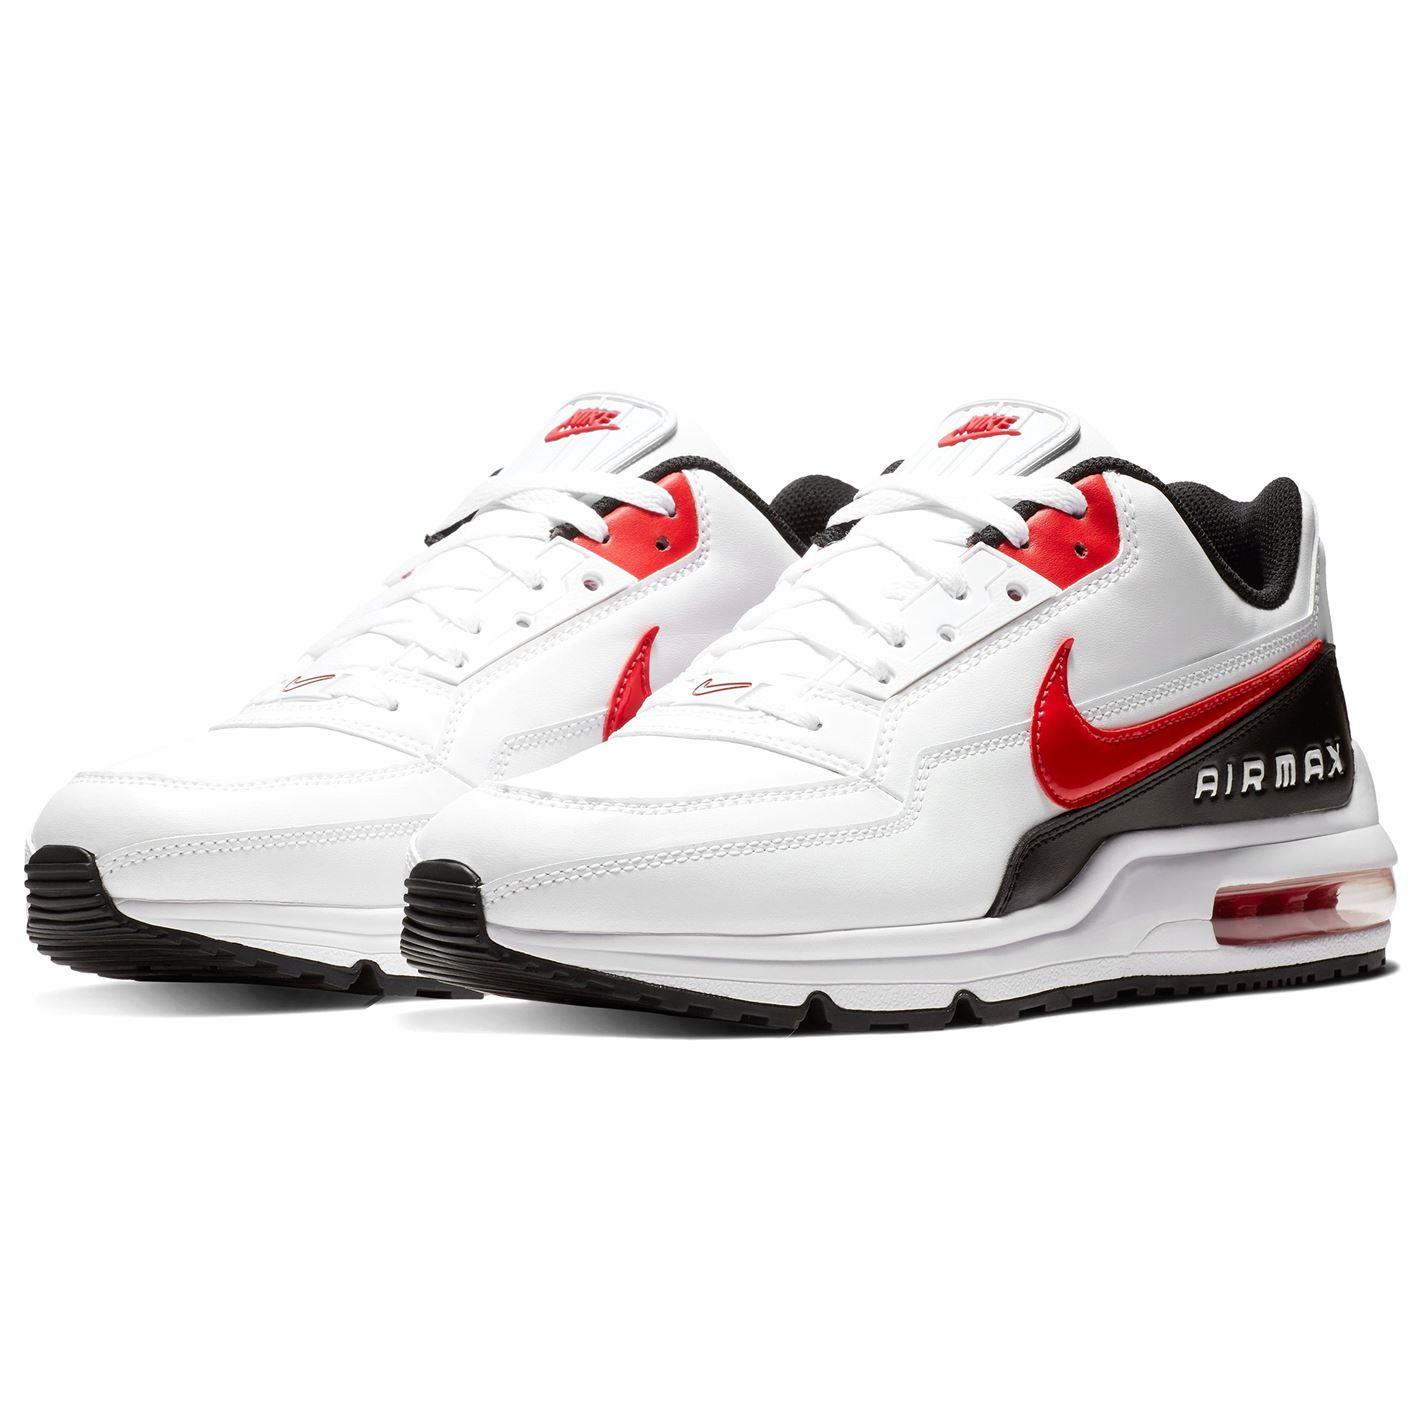 Nike Air Max LTD 3 pánske tenisky